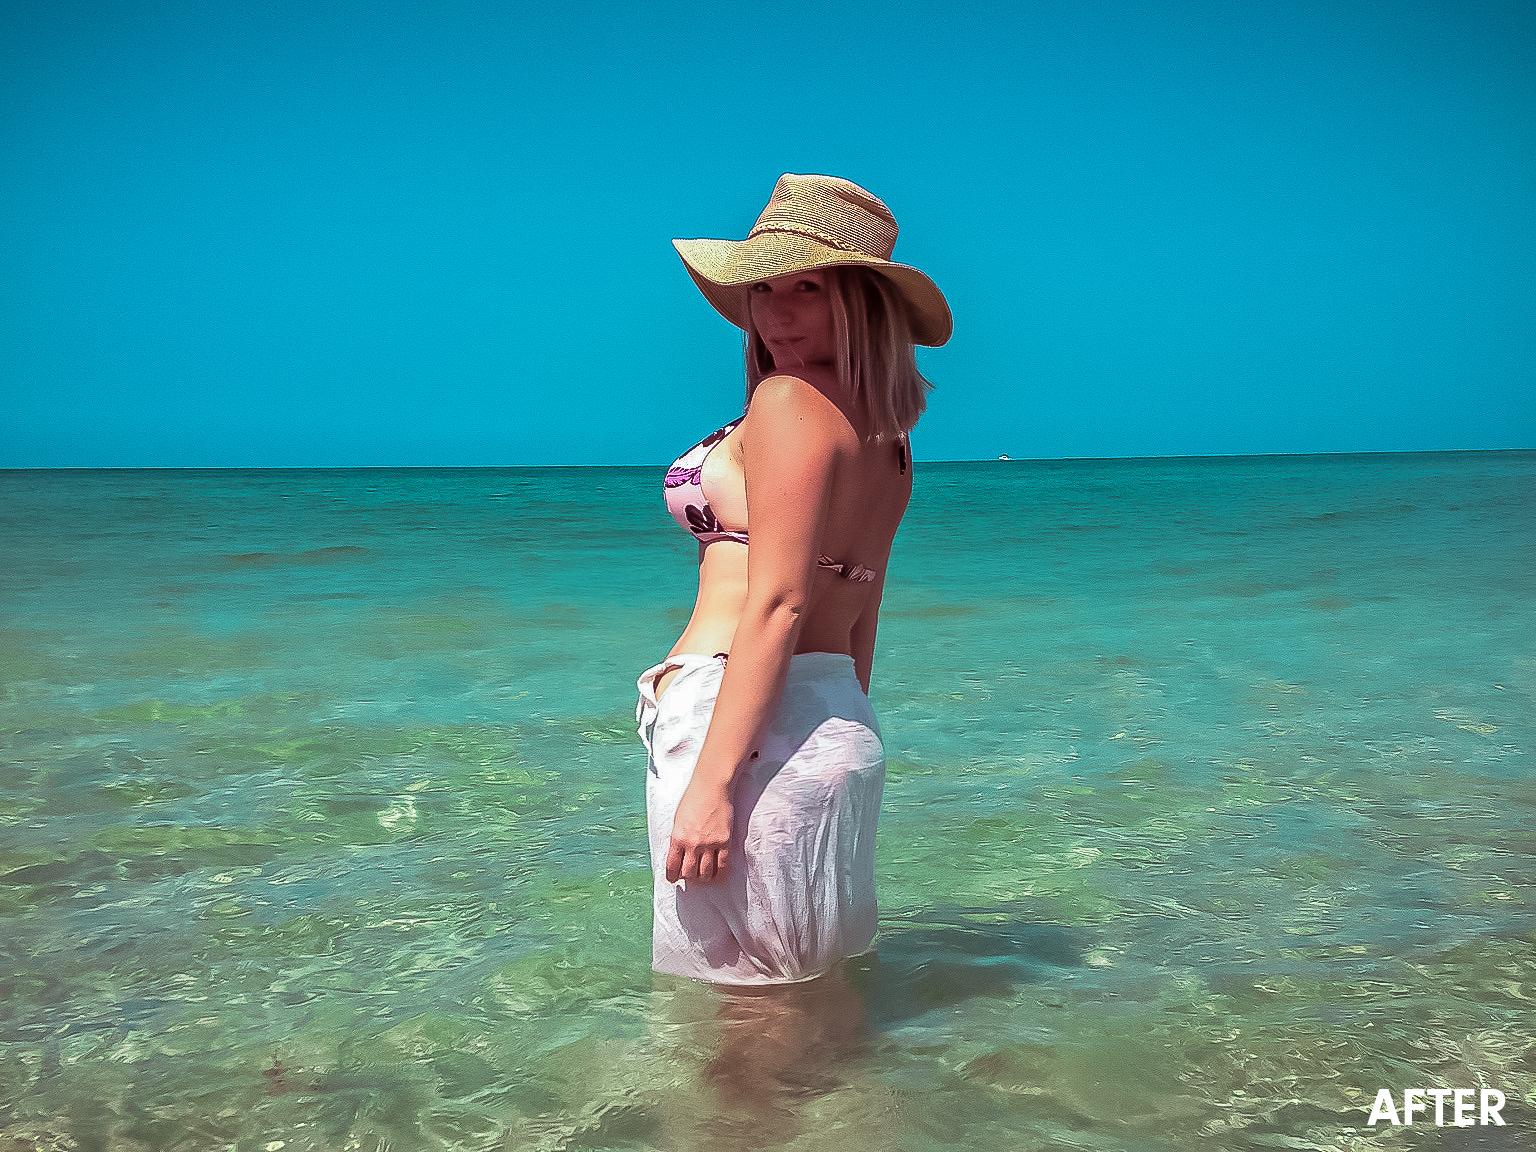 josi-denise-beachchickpeach-lightroom-presets4 (2).jpg